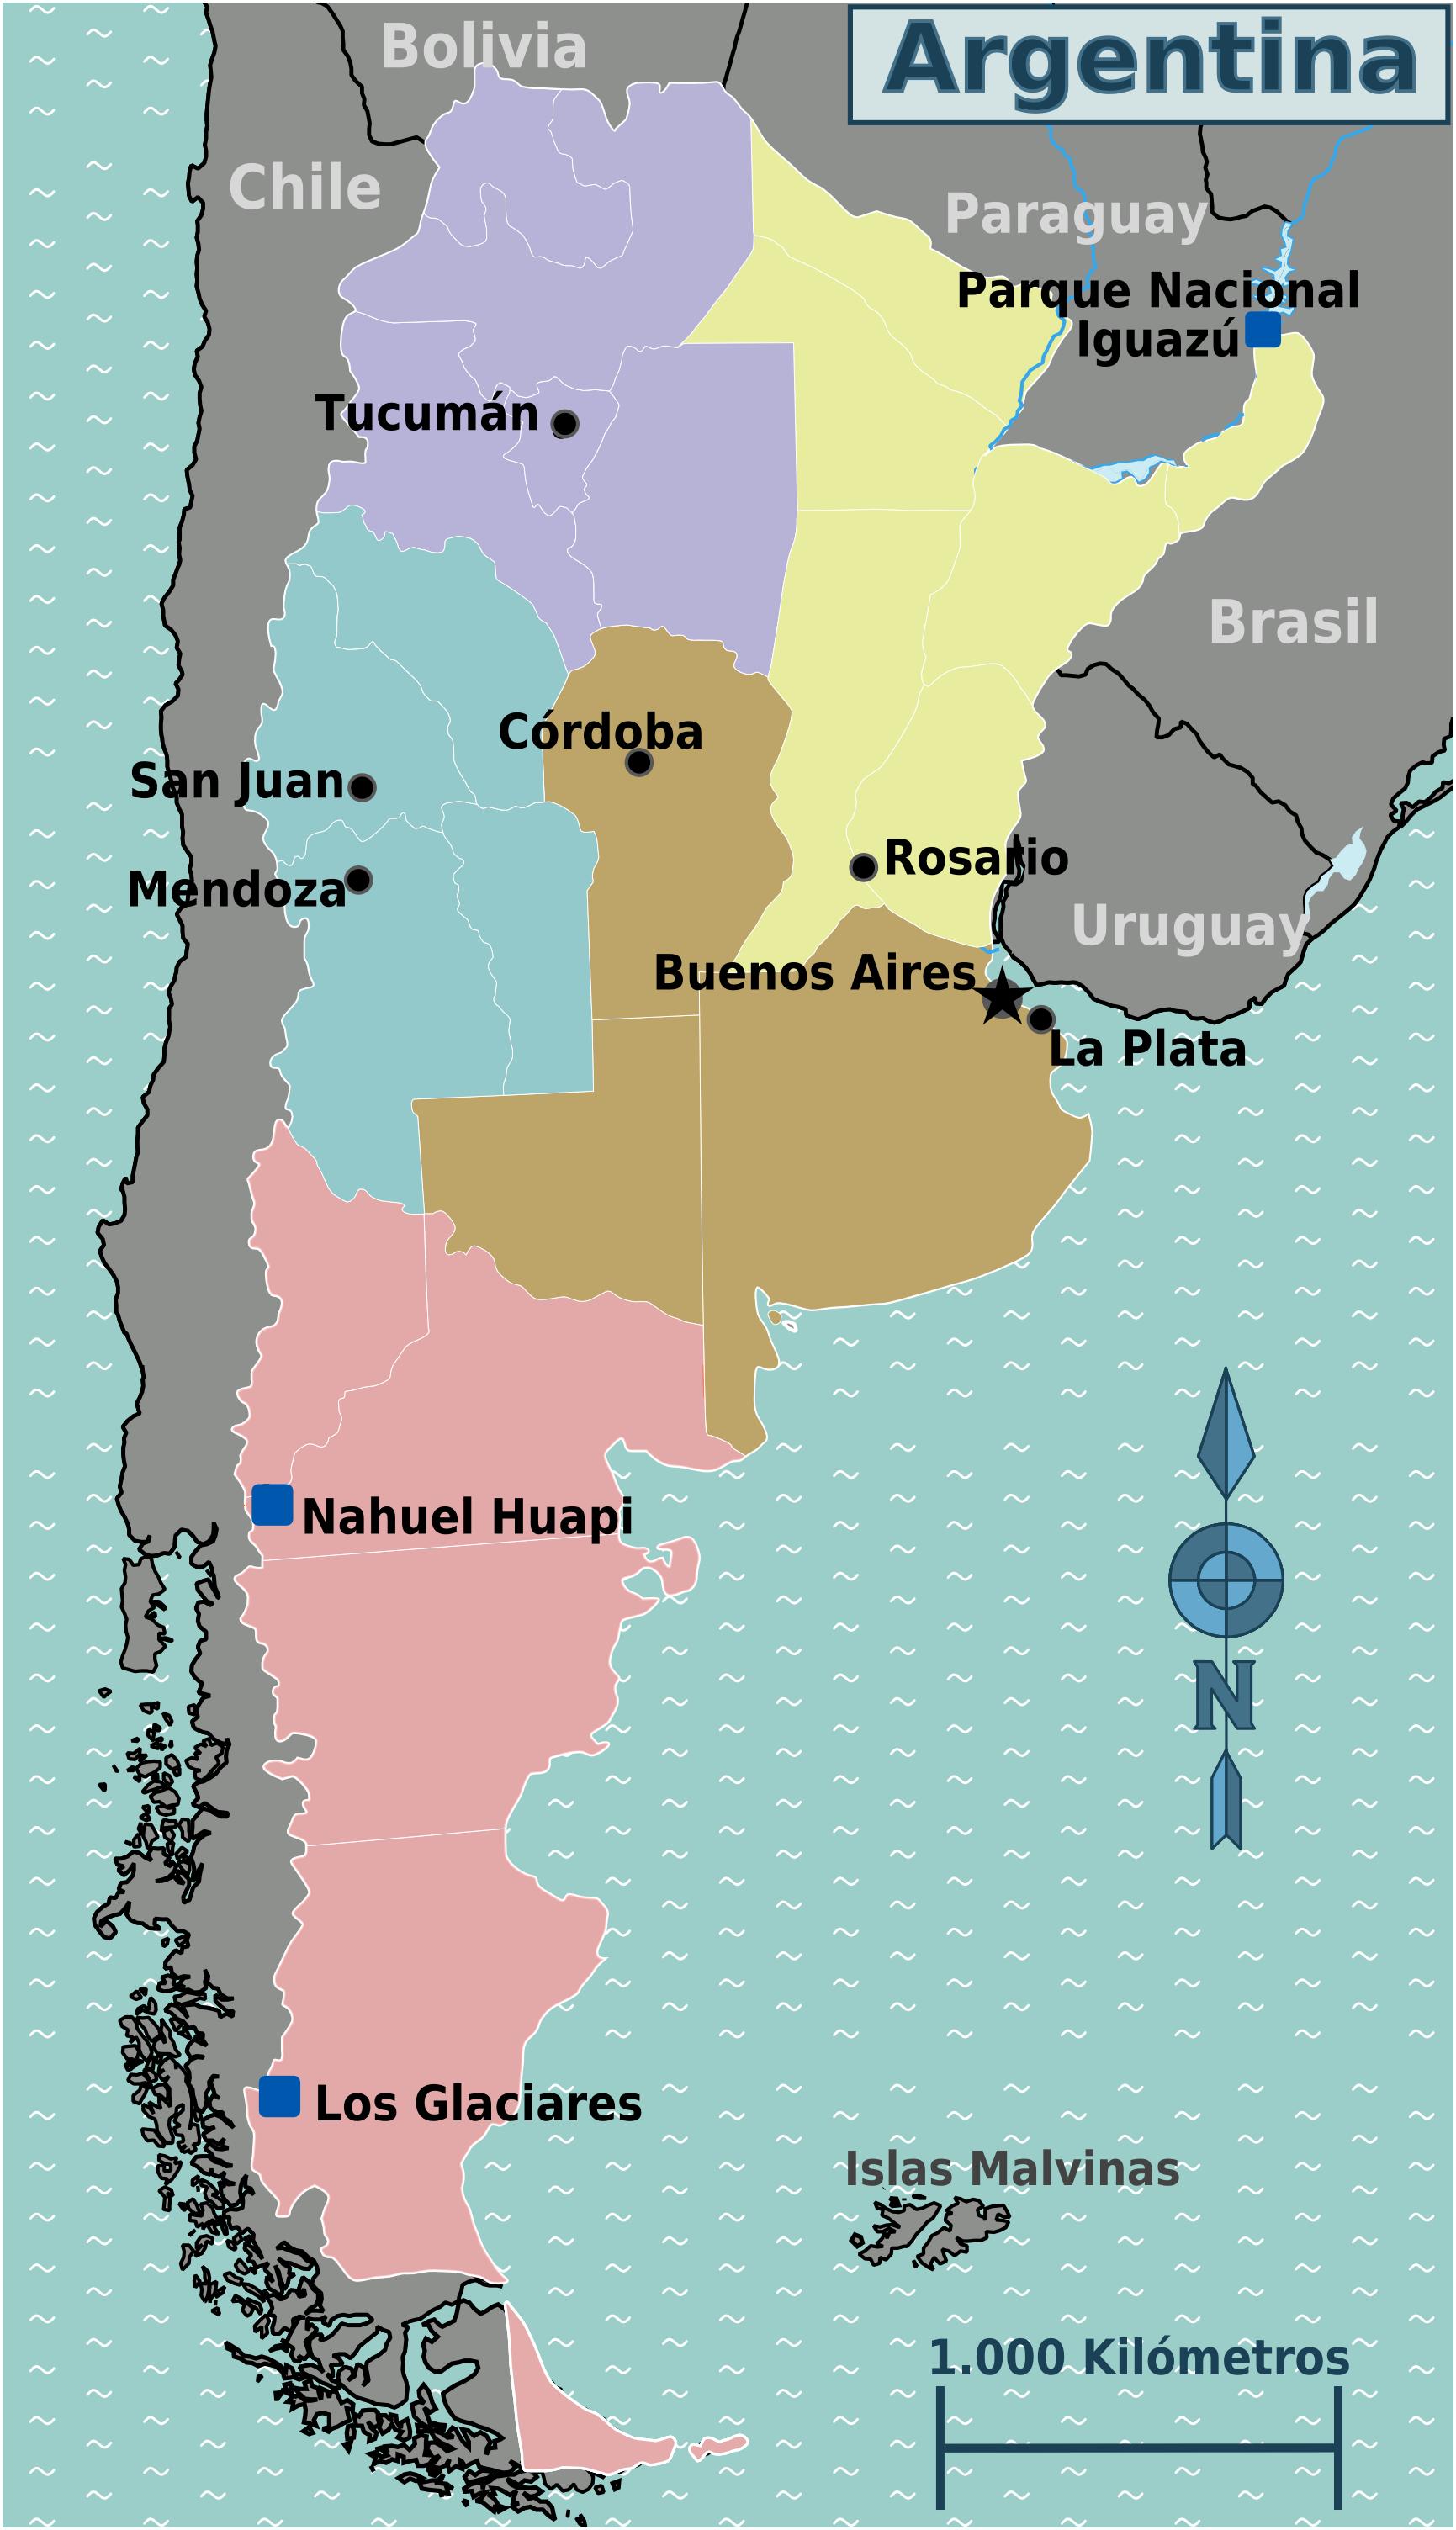 Fileargentina regions map esg wikimedia commons fileargentina regions map esg sciox Choice Image